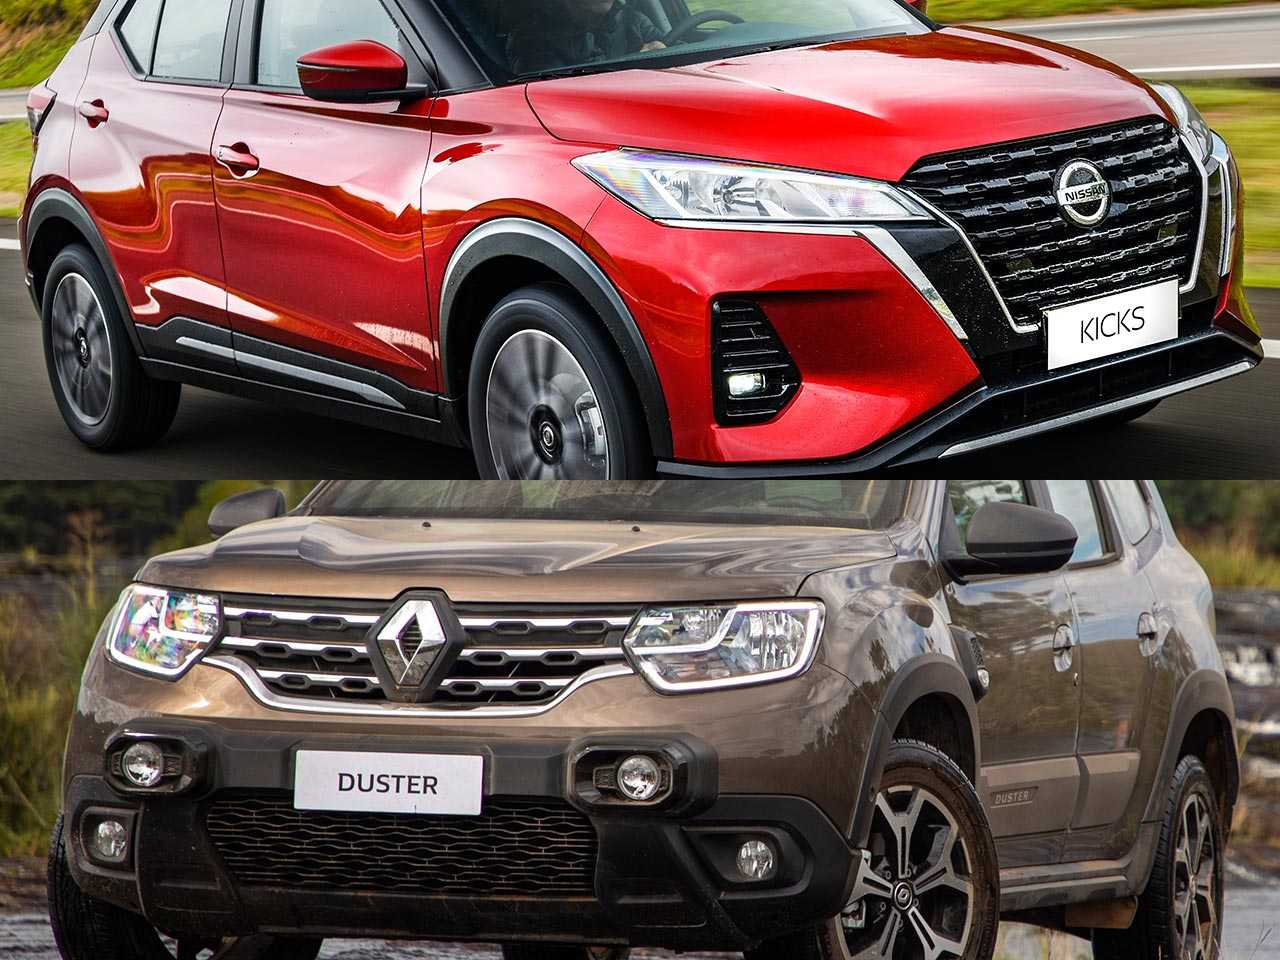 Nissan Kicks e Renault Duster